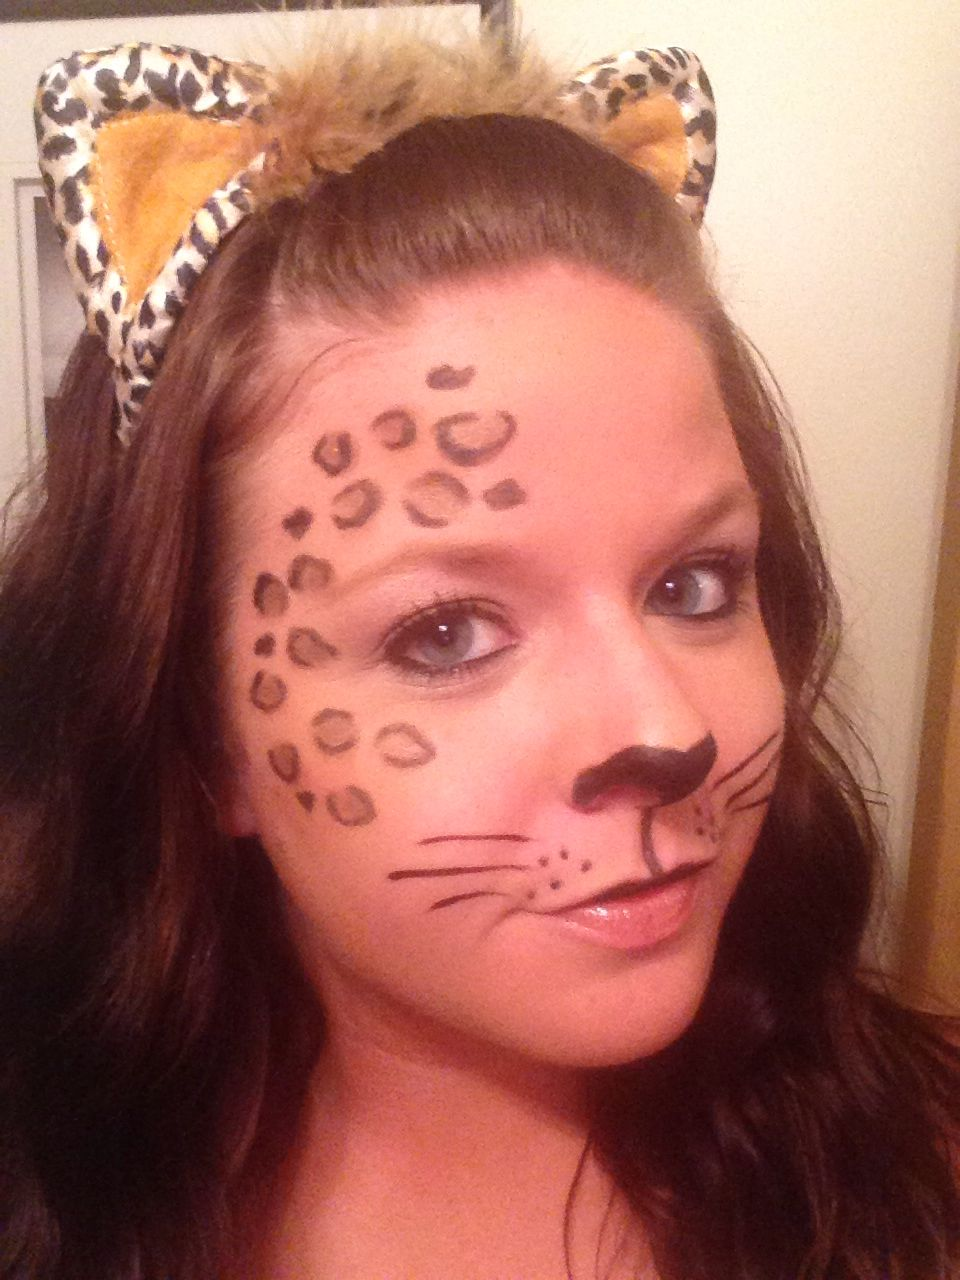 leopard makeup halloween pinterest fasching. Black Bedroom Furniture Sets. Home Design Ideas